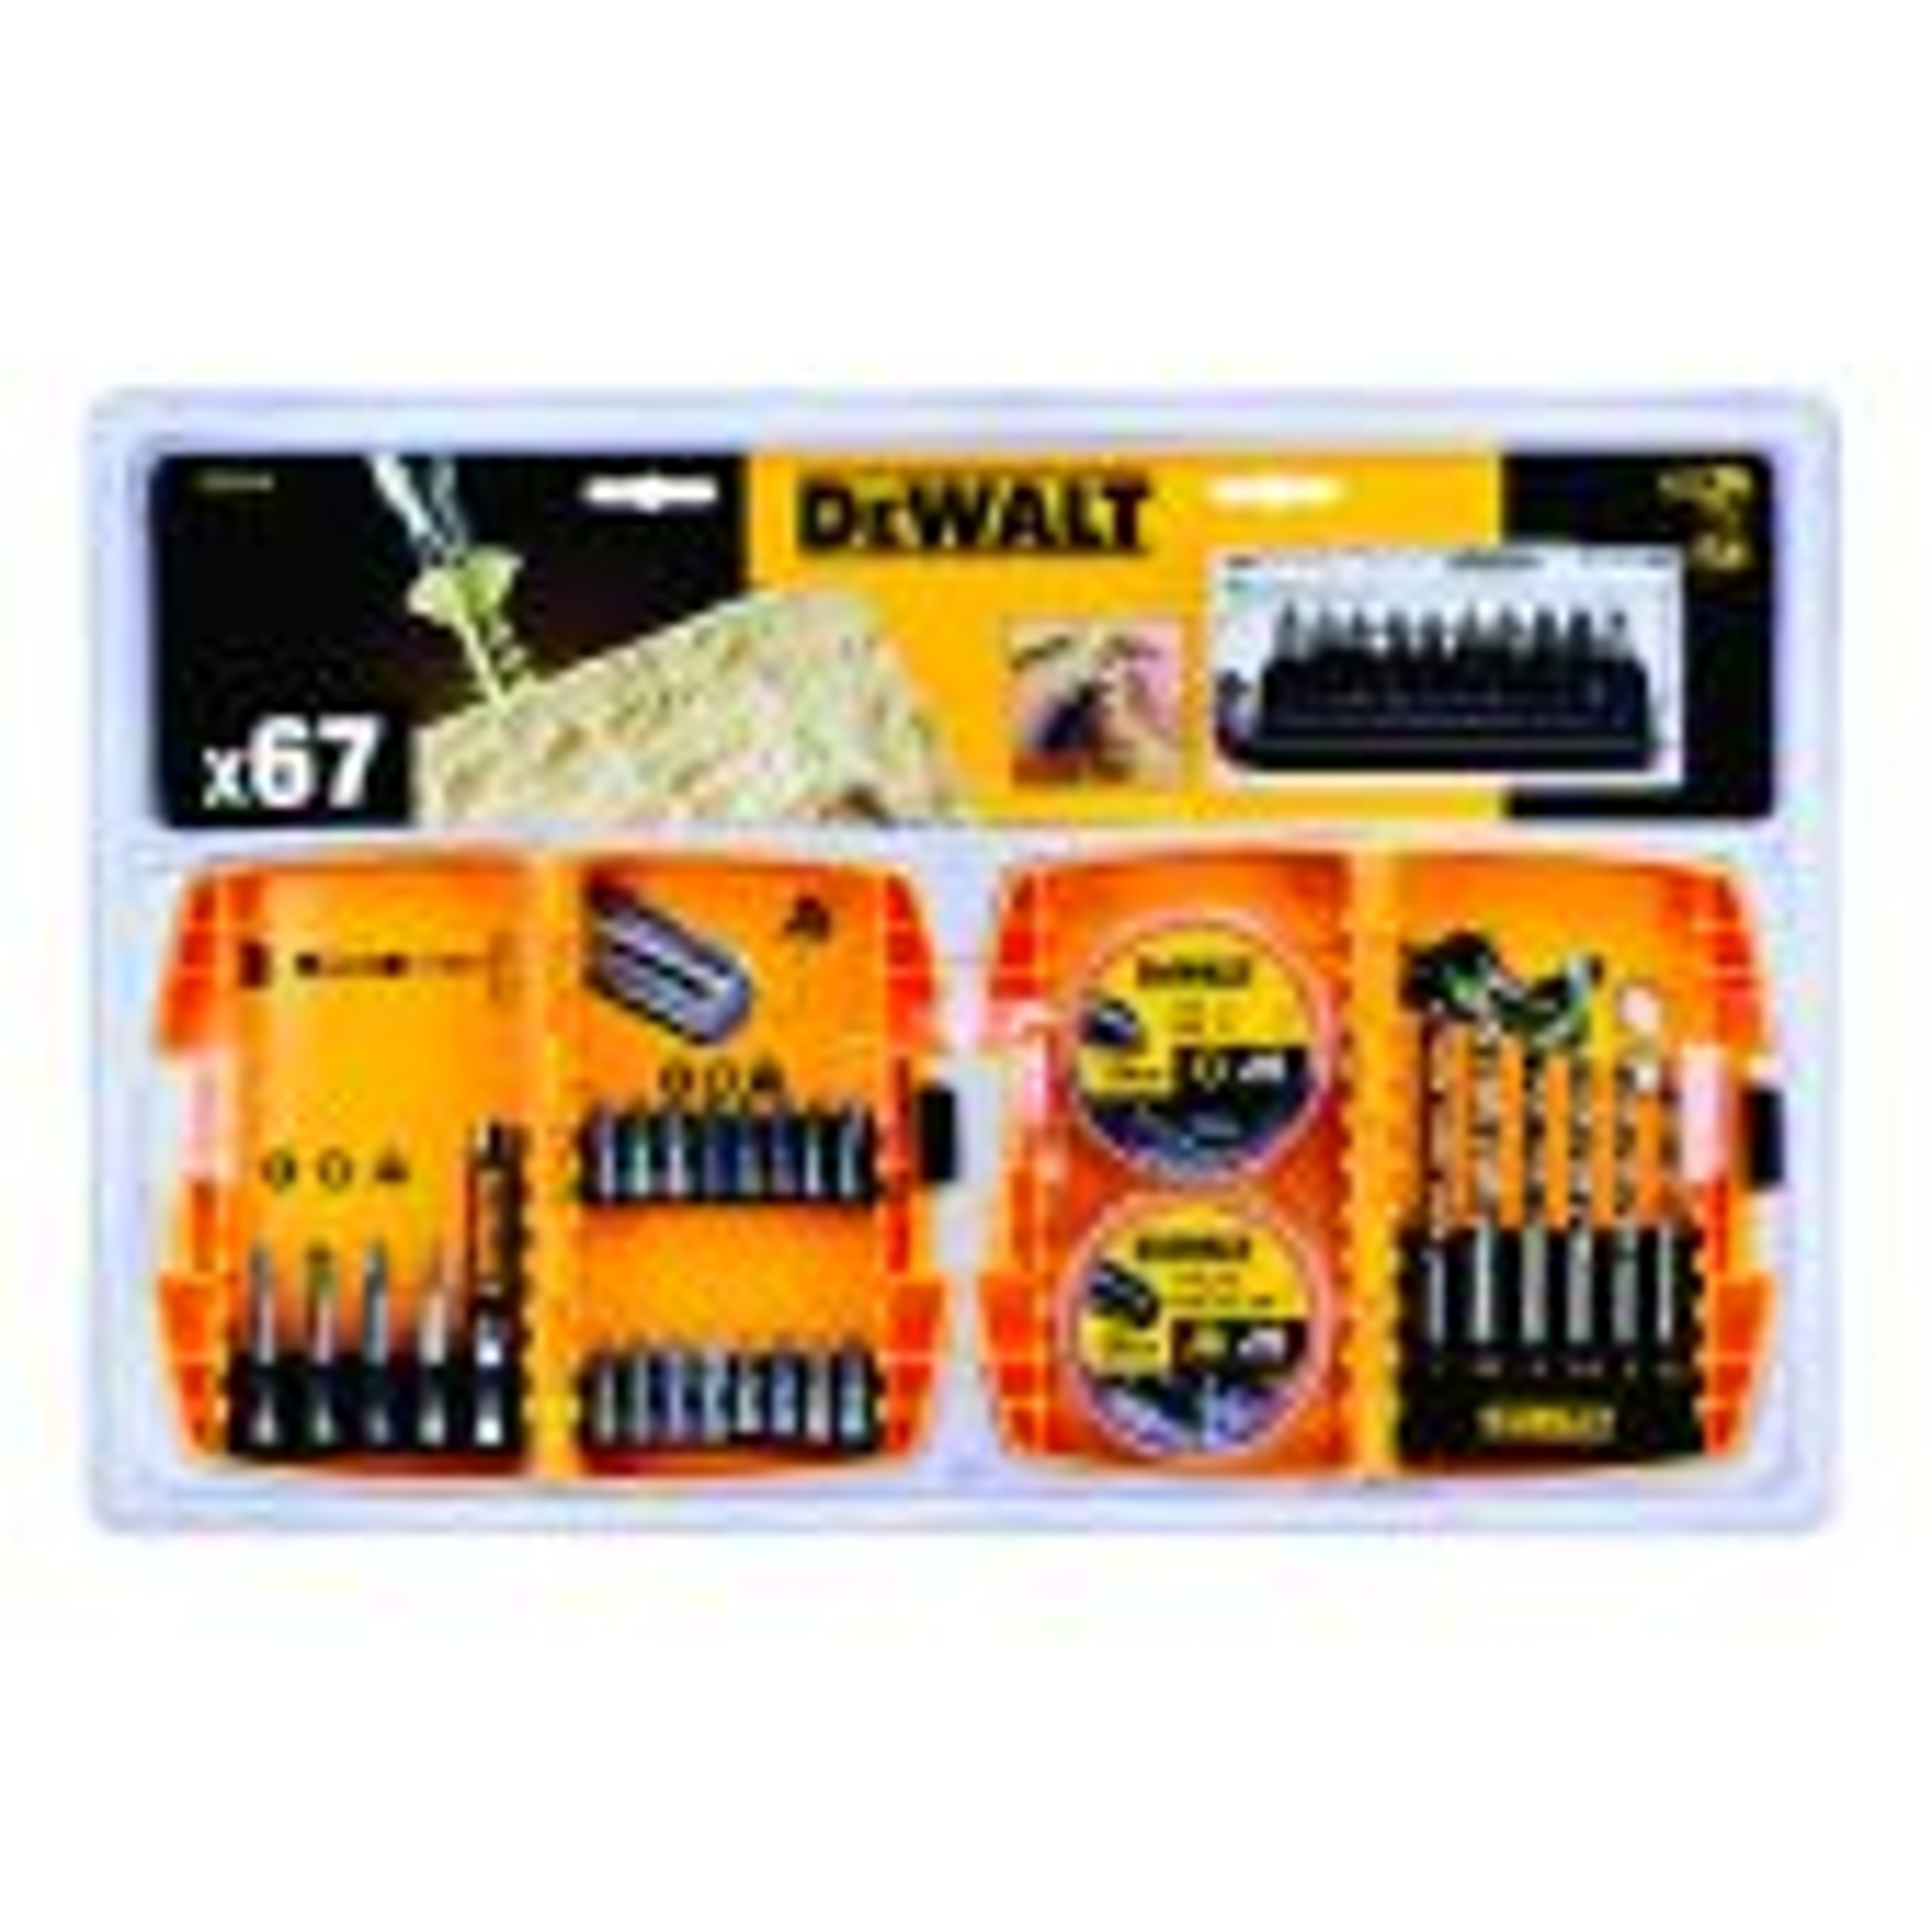 DEWALT DT71515-QZ 67 PIECE DRILLING AND SCREWDRIVING SET